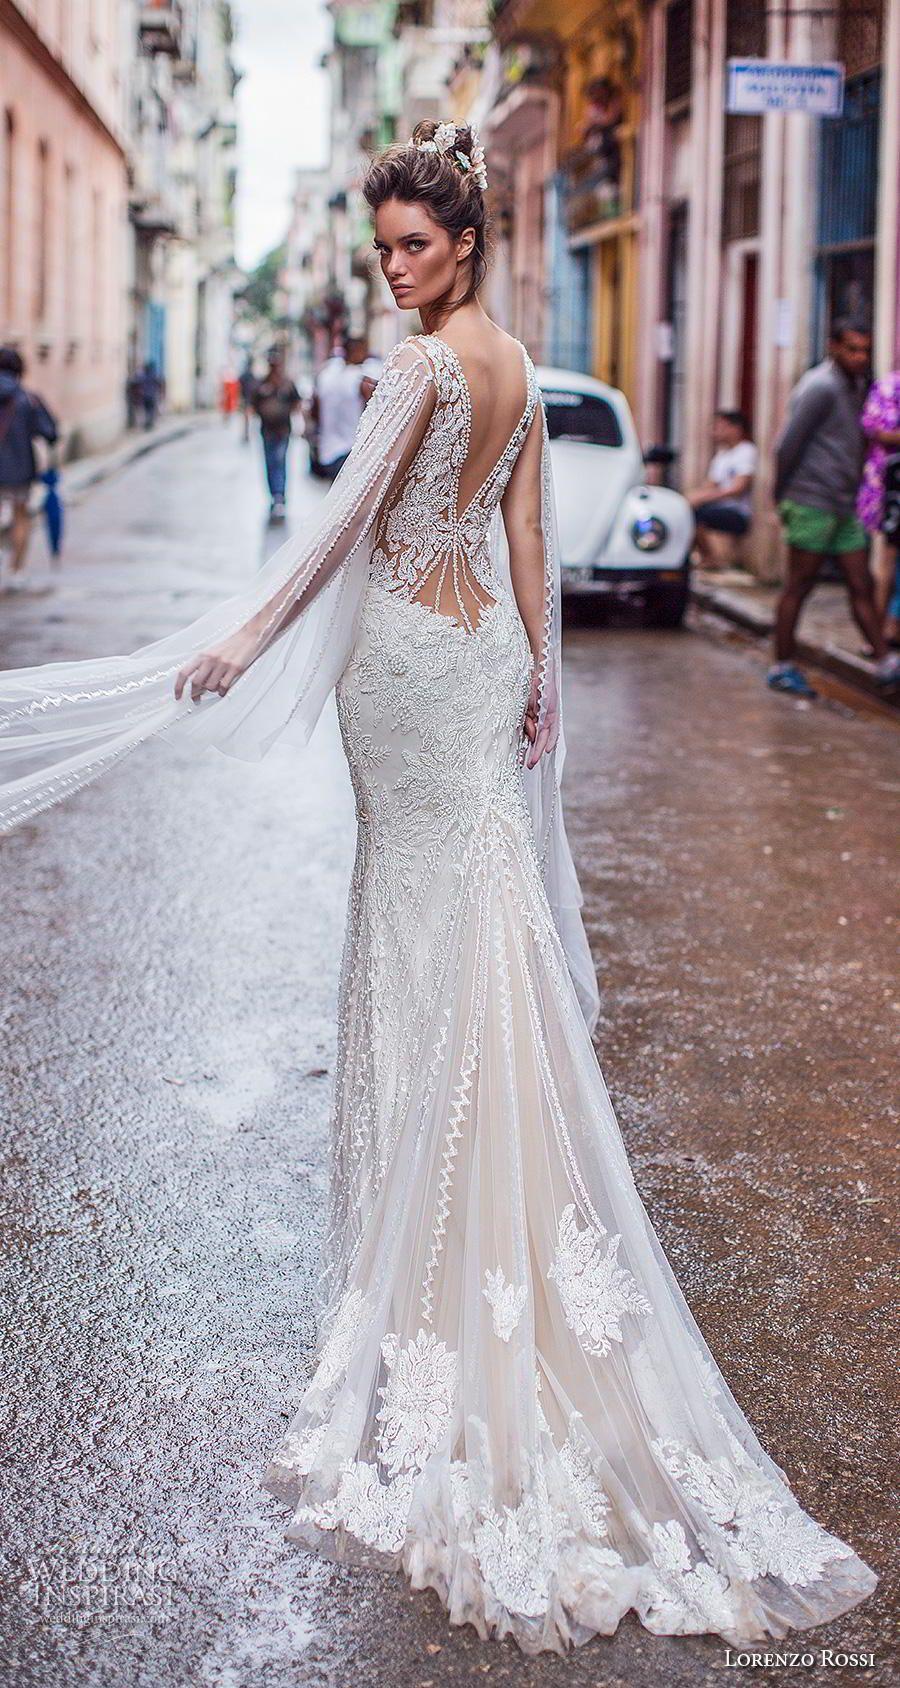 Elegant fitted wedding dresses  Lorenzo Rossi  Wedding Dresses u ucHavanaud Bridal Campaign